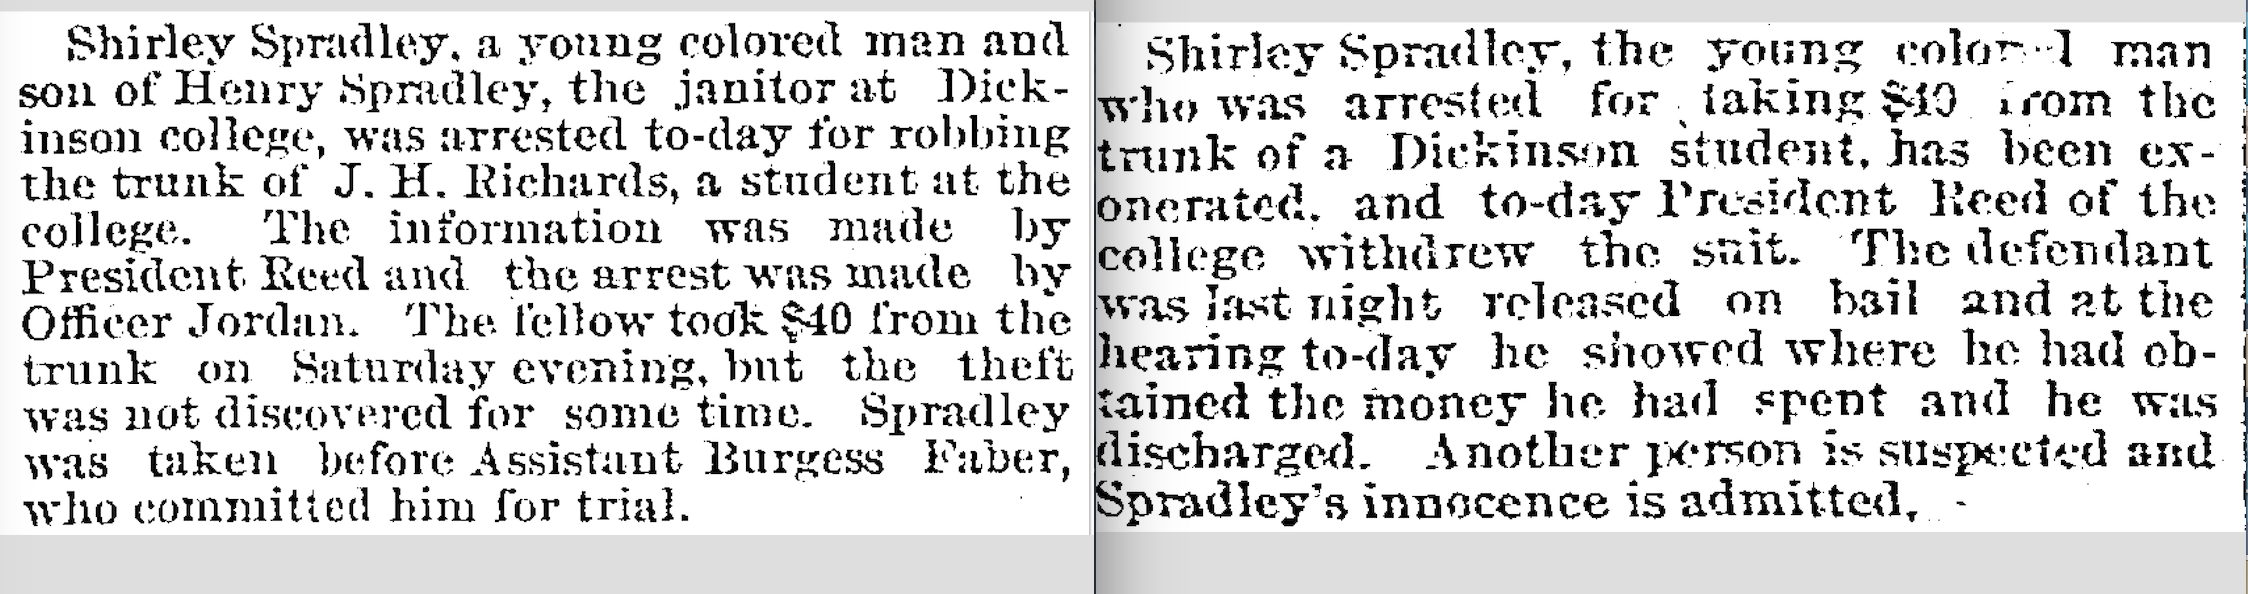 Shirley Spradley's arrest